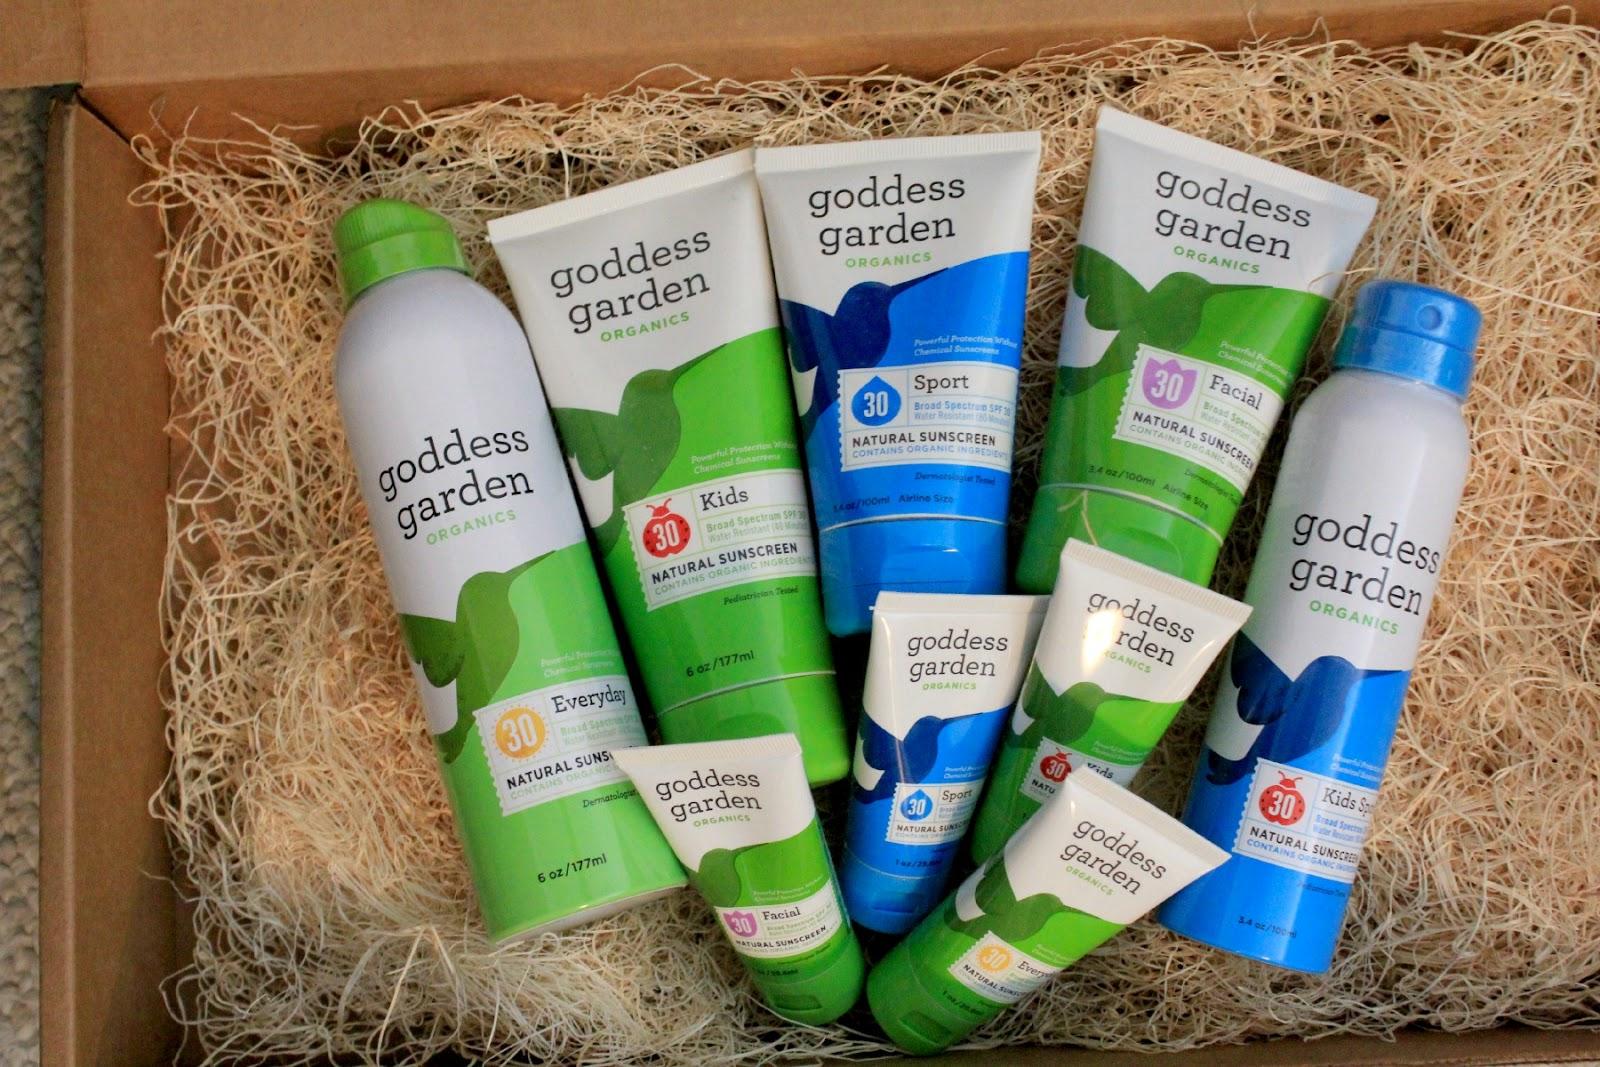 Goddess Garden Organics #GoddessGarden #ad